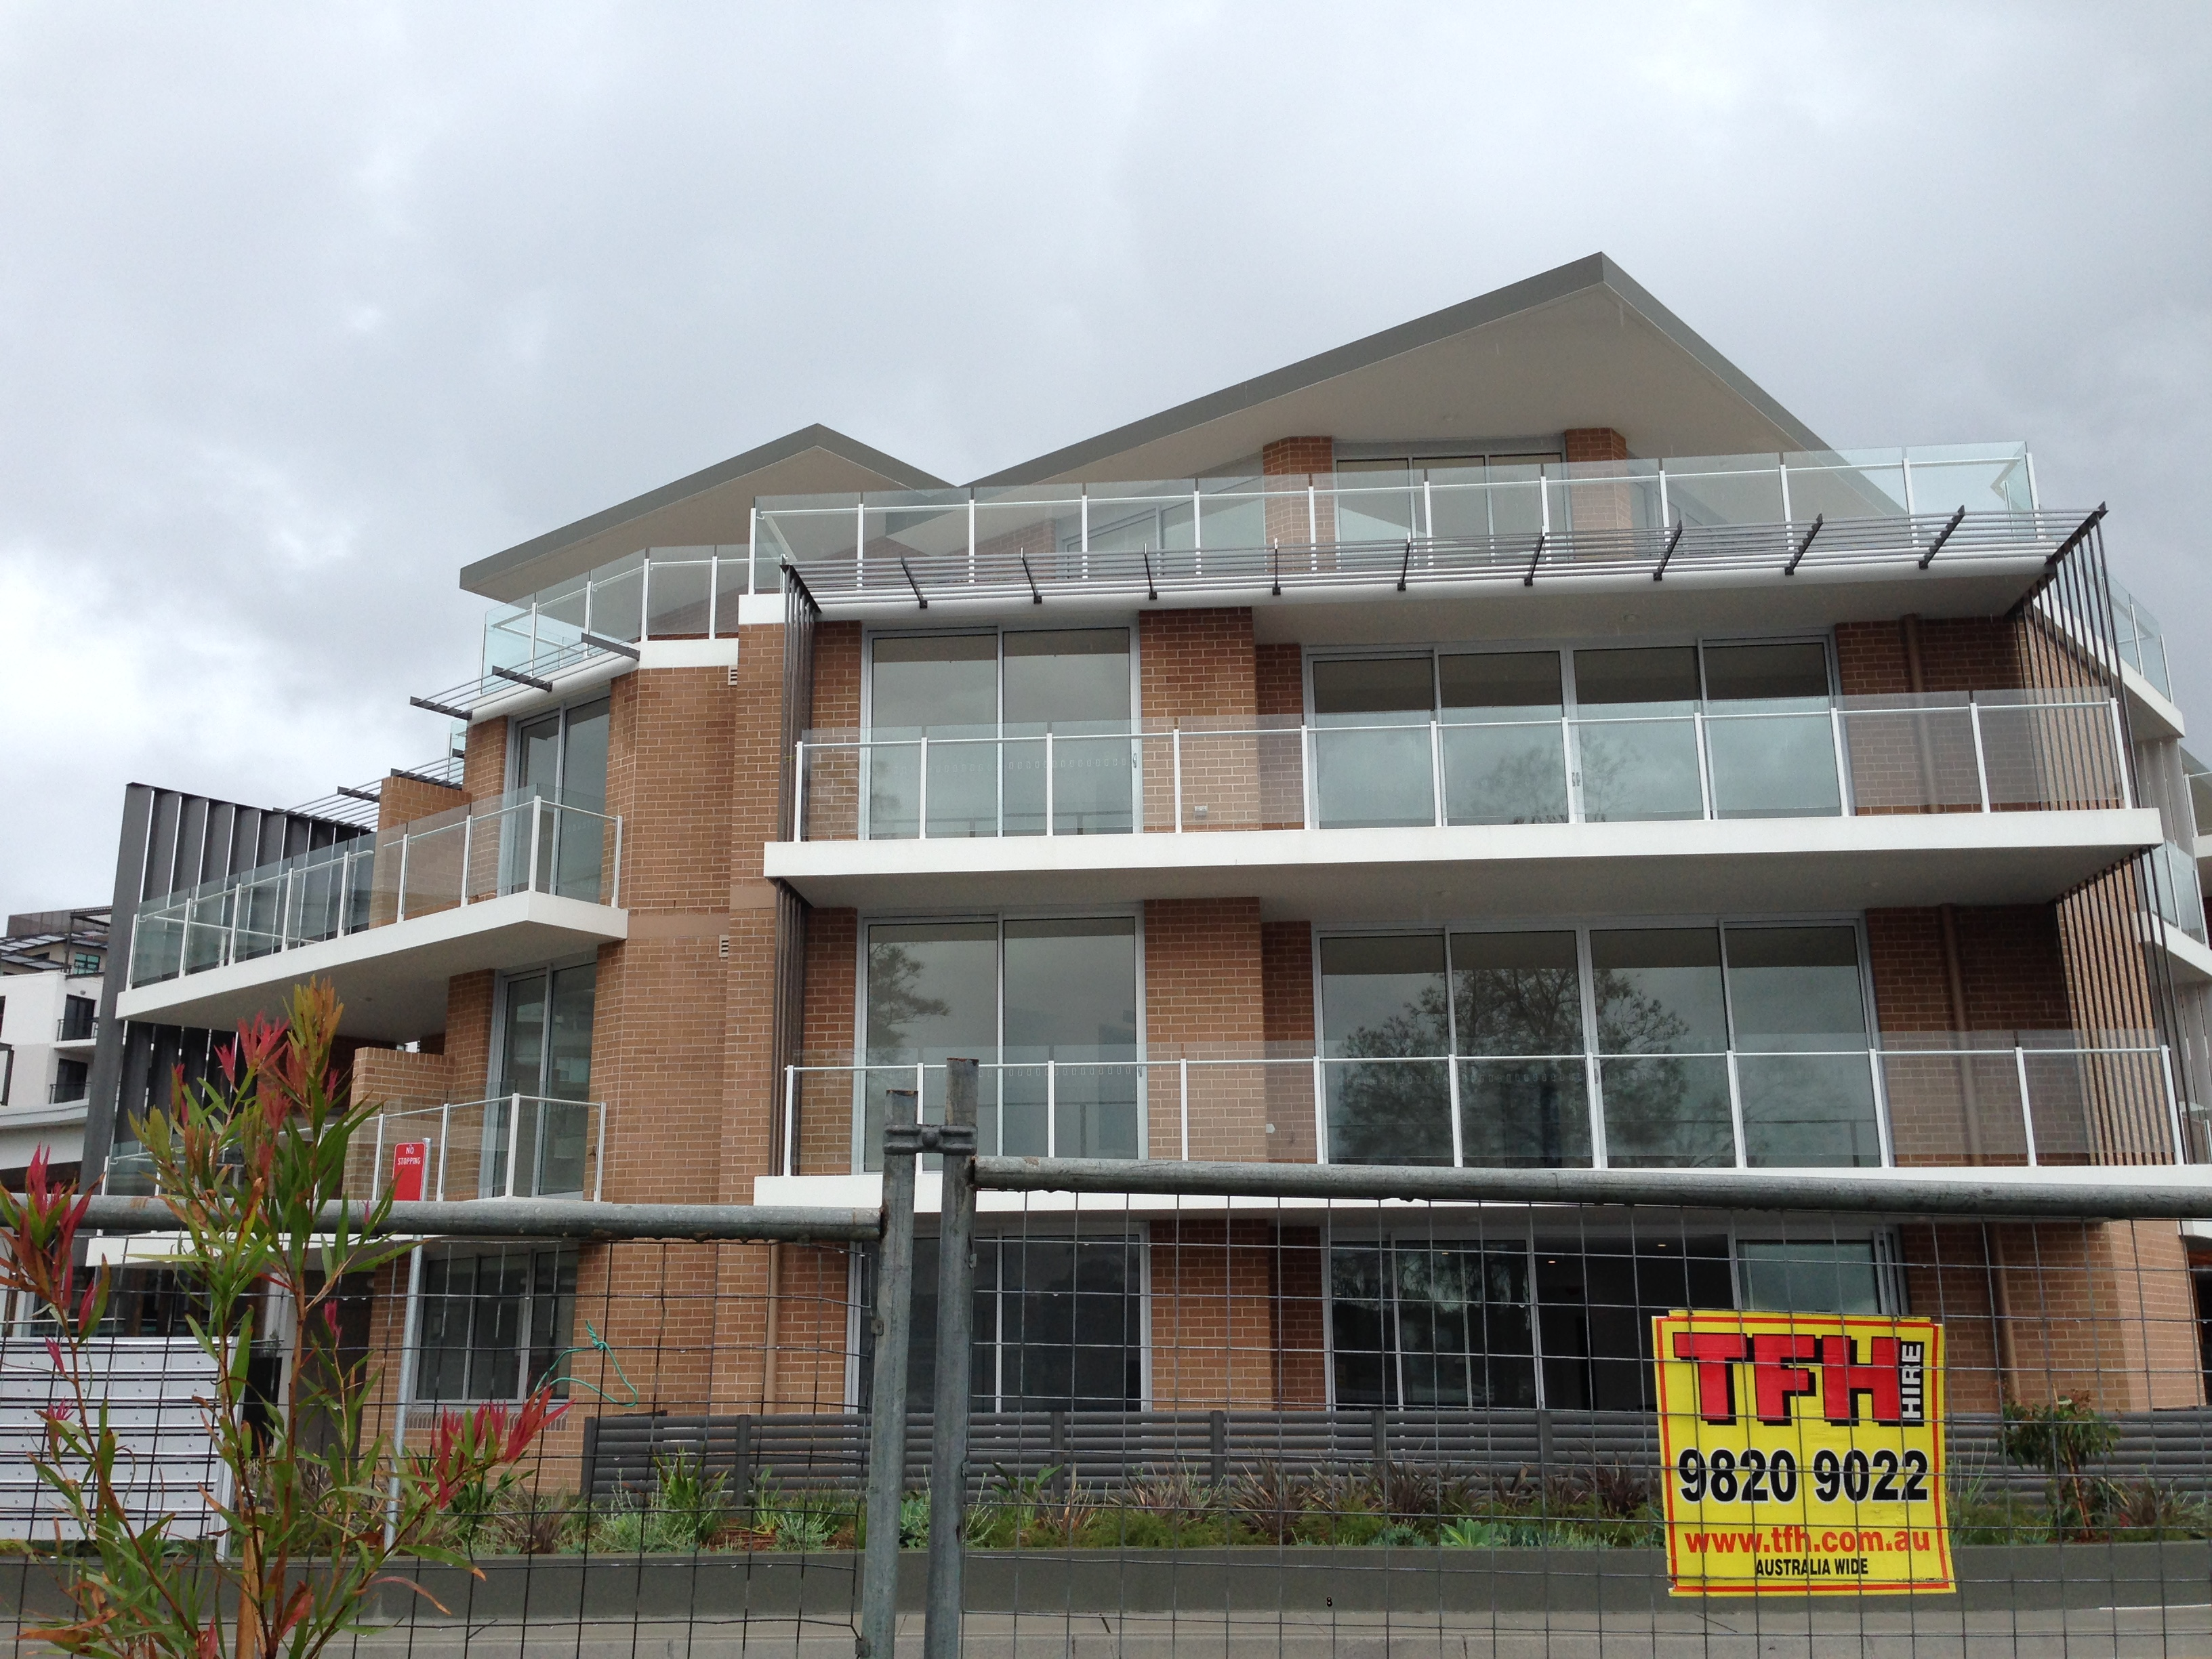 Sydney Aged Care-Balcony Glass